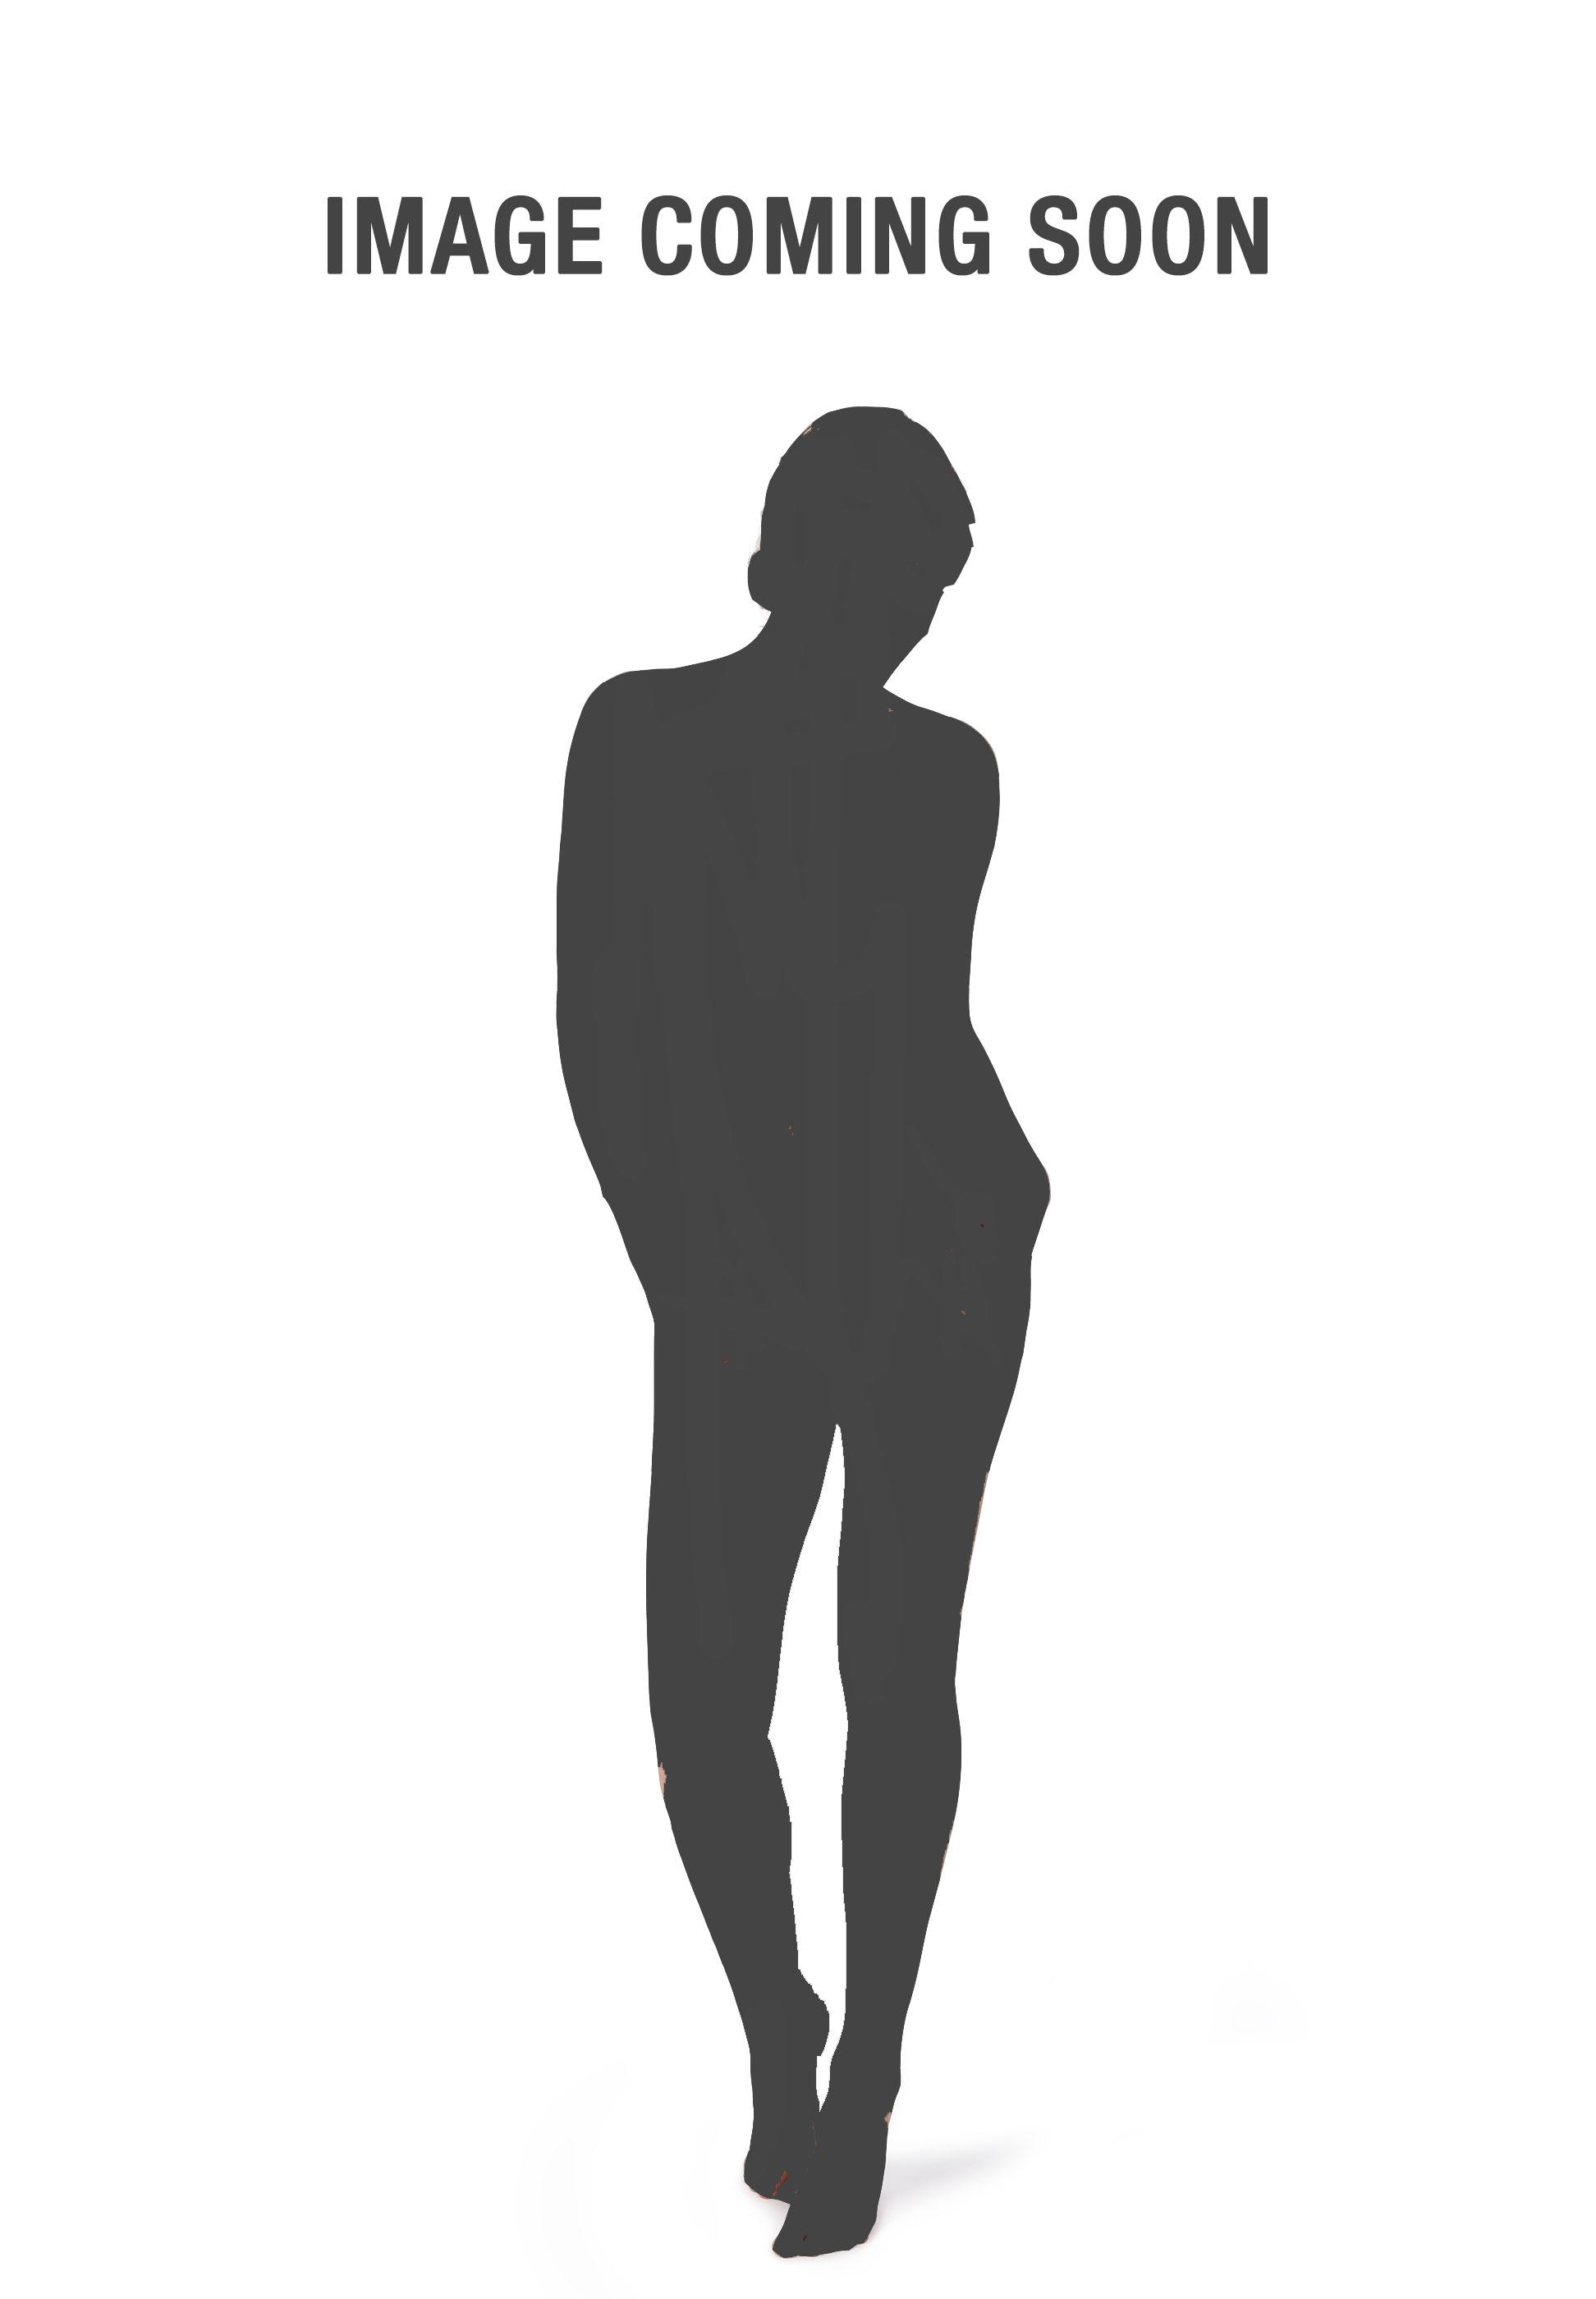 Huber_Basic_M_24hoursmensleep_shorts_117799_016606_010.jpg